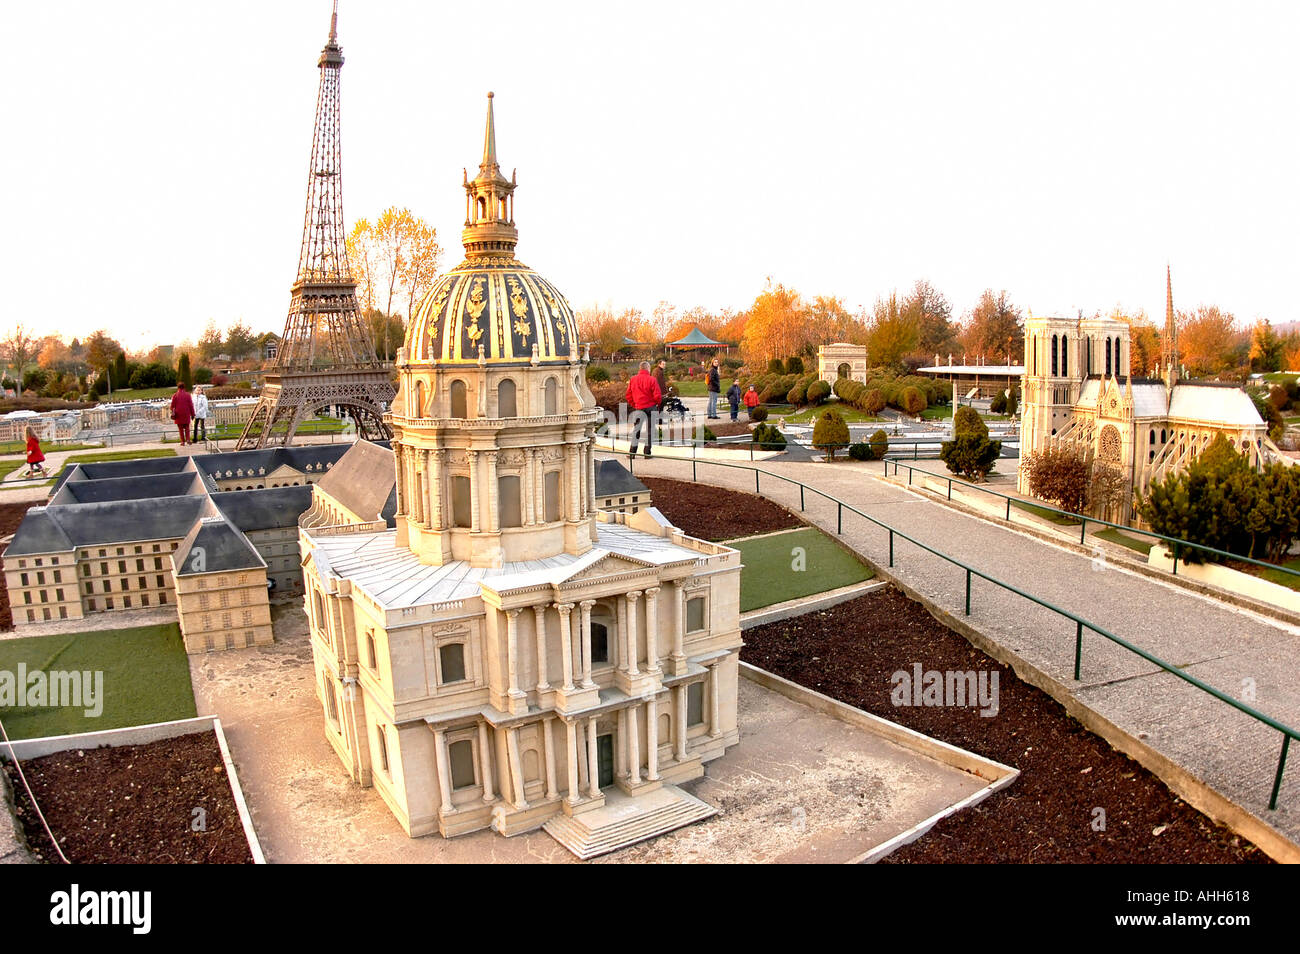 Elancourt, France, Theme Park 'France Miniature' Architectural Models, French Monuments, Paris - Stock Image